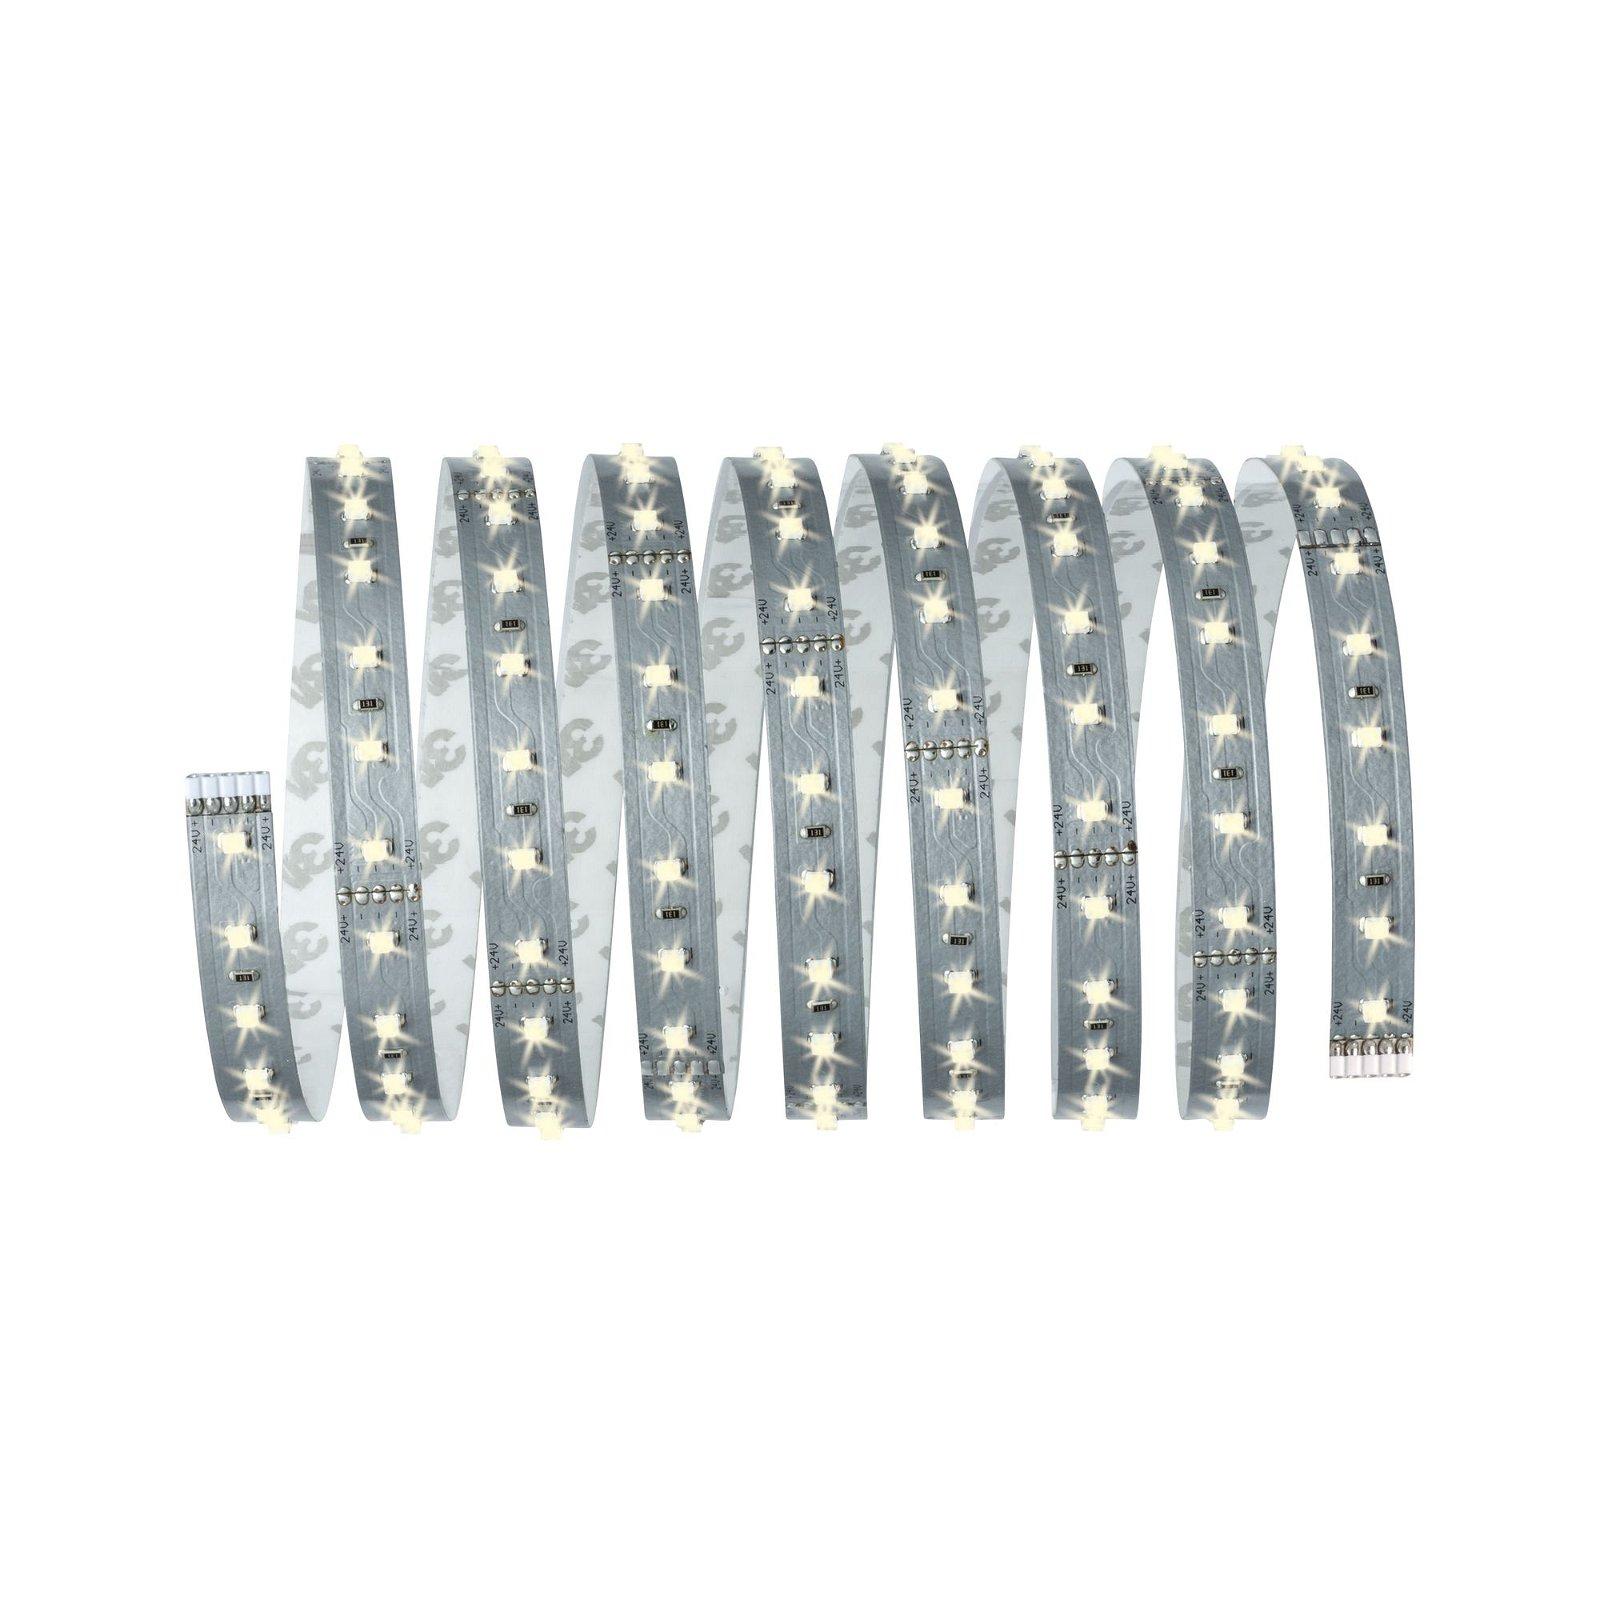 MaxLED 500 LED Strip Tageslichtweiß 2,5m 14W 550lm/m 6500K